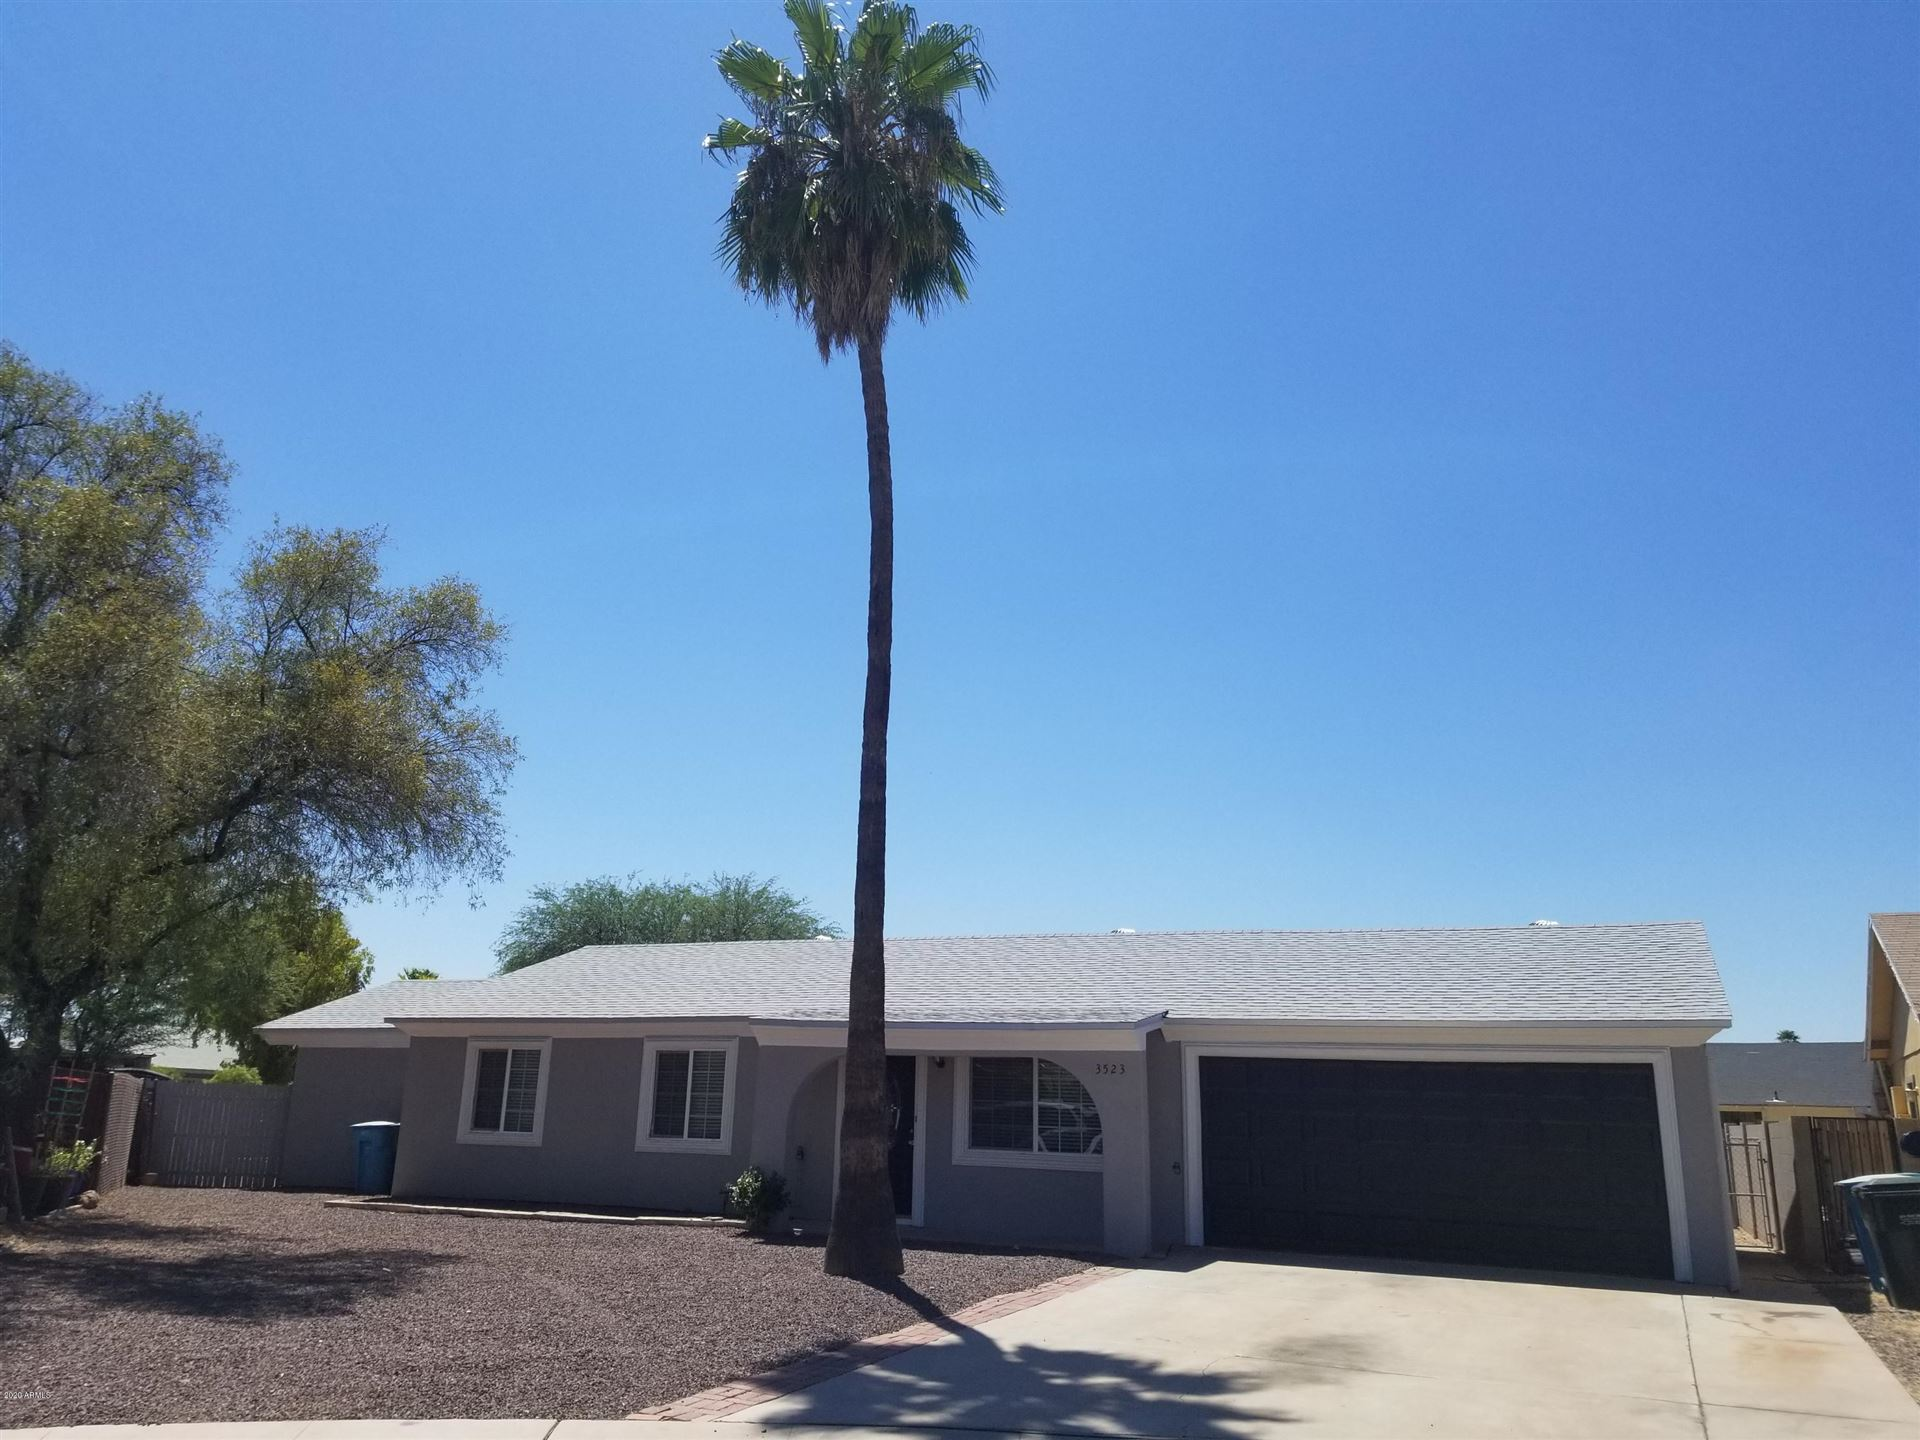 3523 E EVERETT Drive, Phoenix, AZ 85032 - #: 6078712